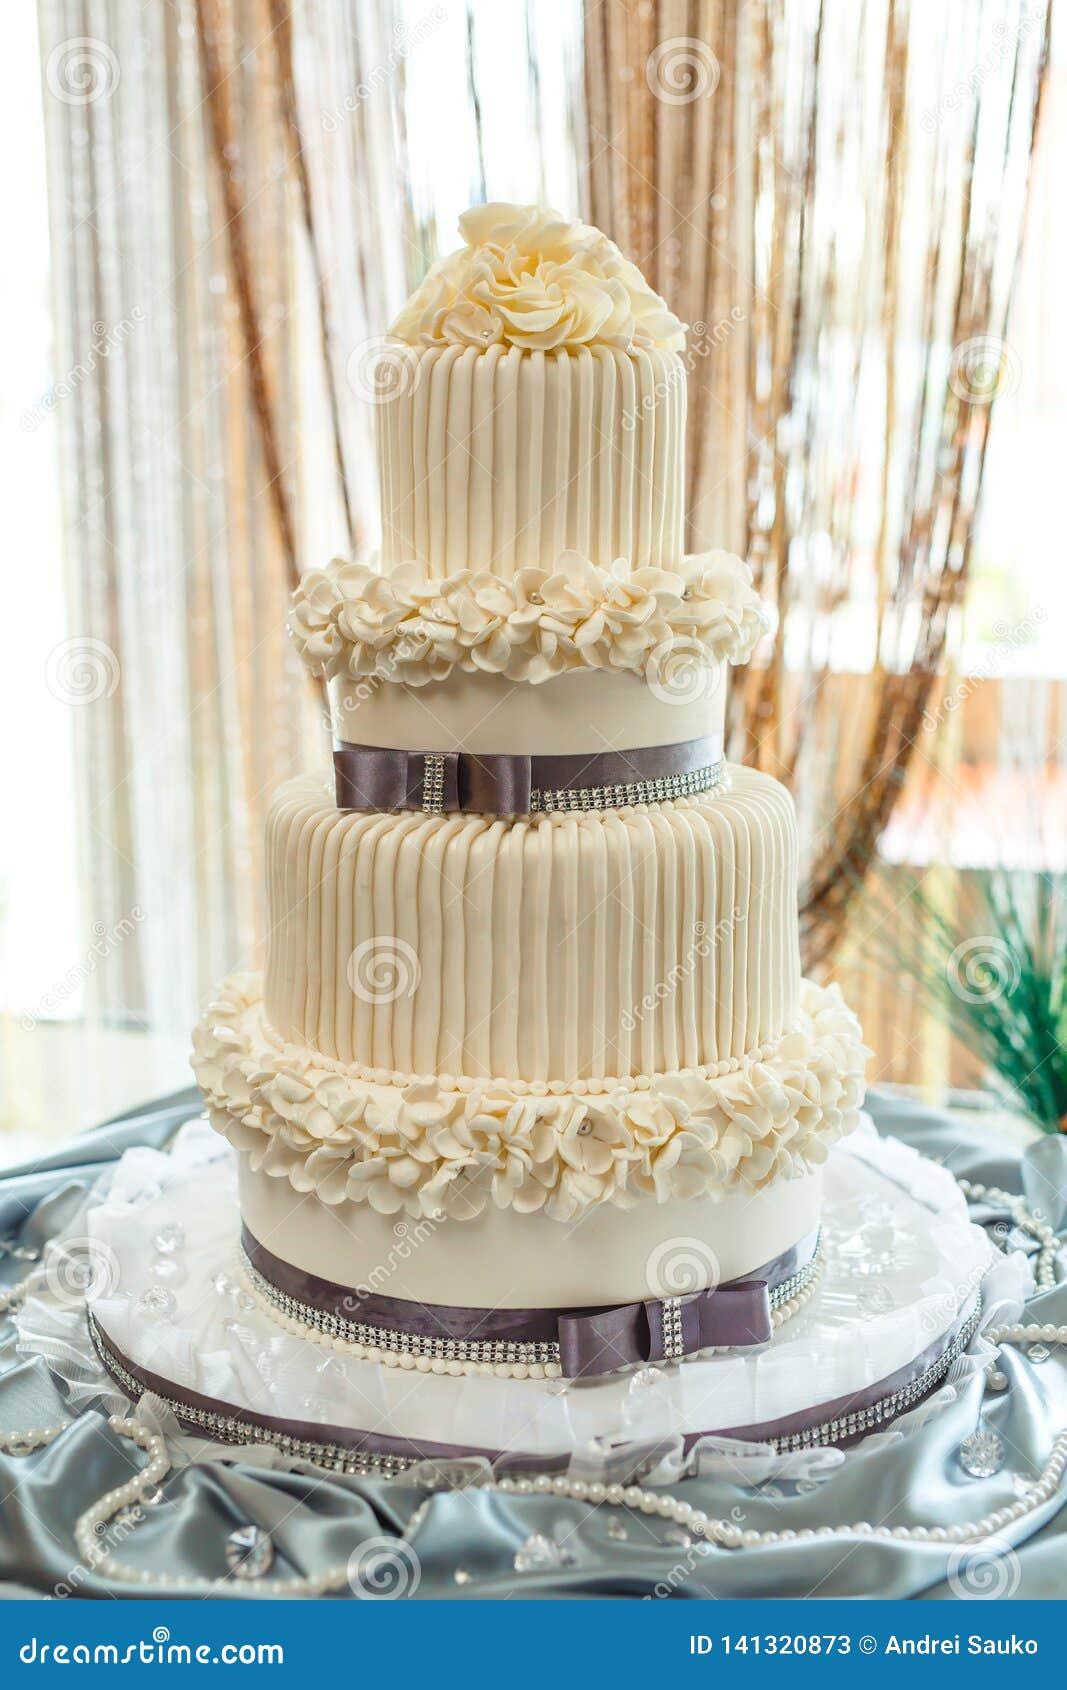 Big two-level anniversary wedding cake